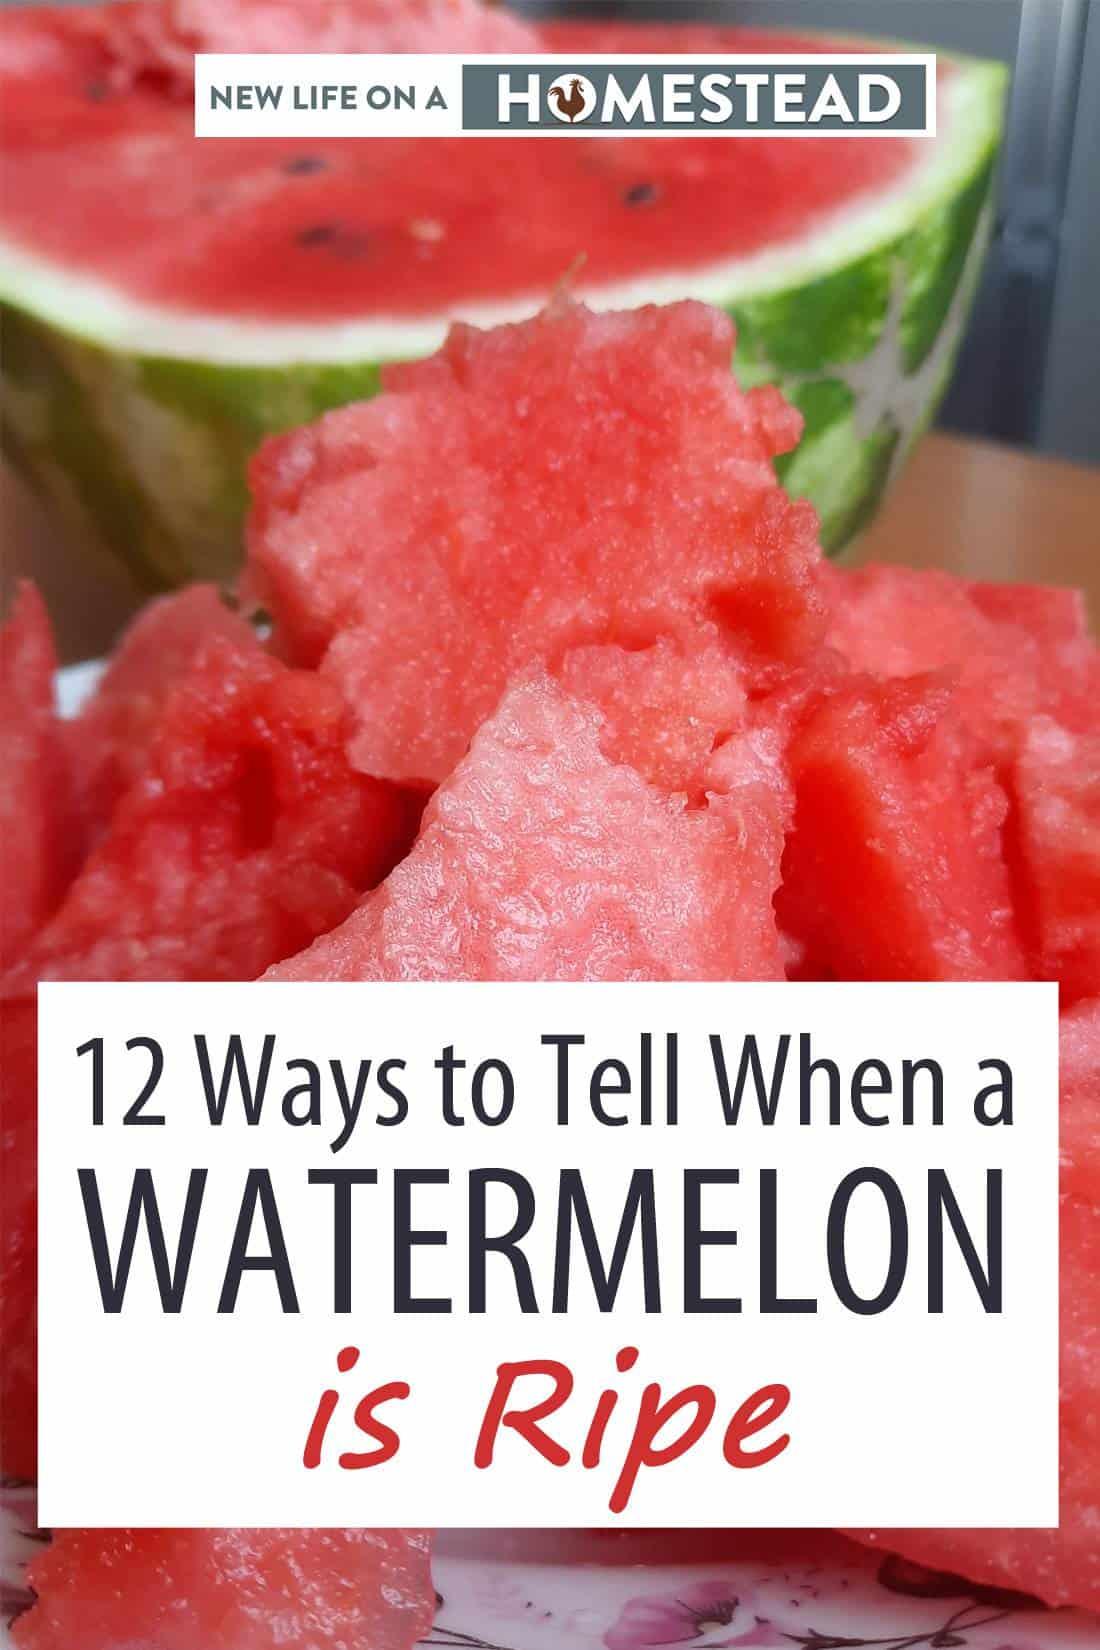 watermelon ripeness Pinterest image